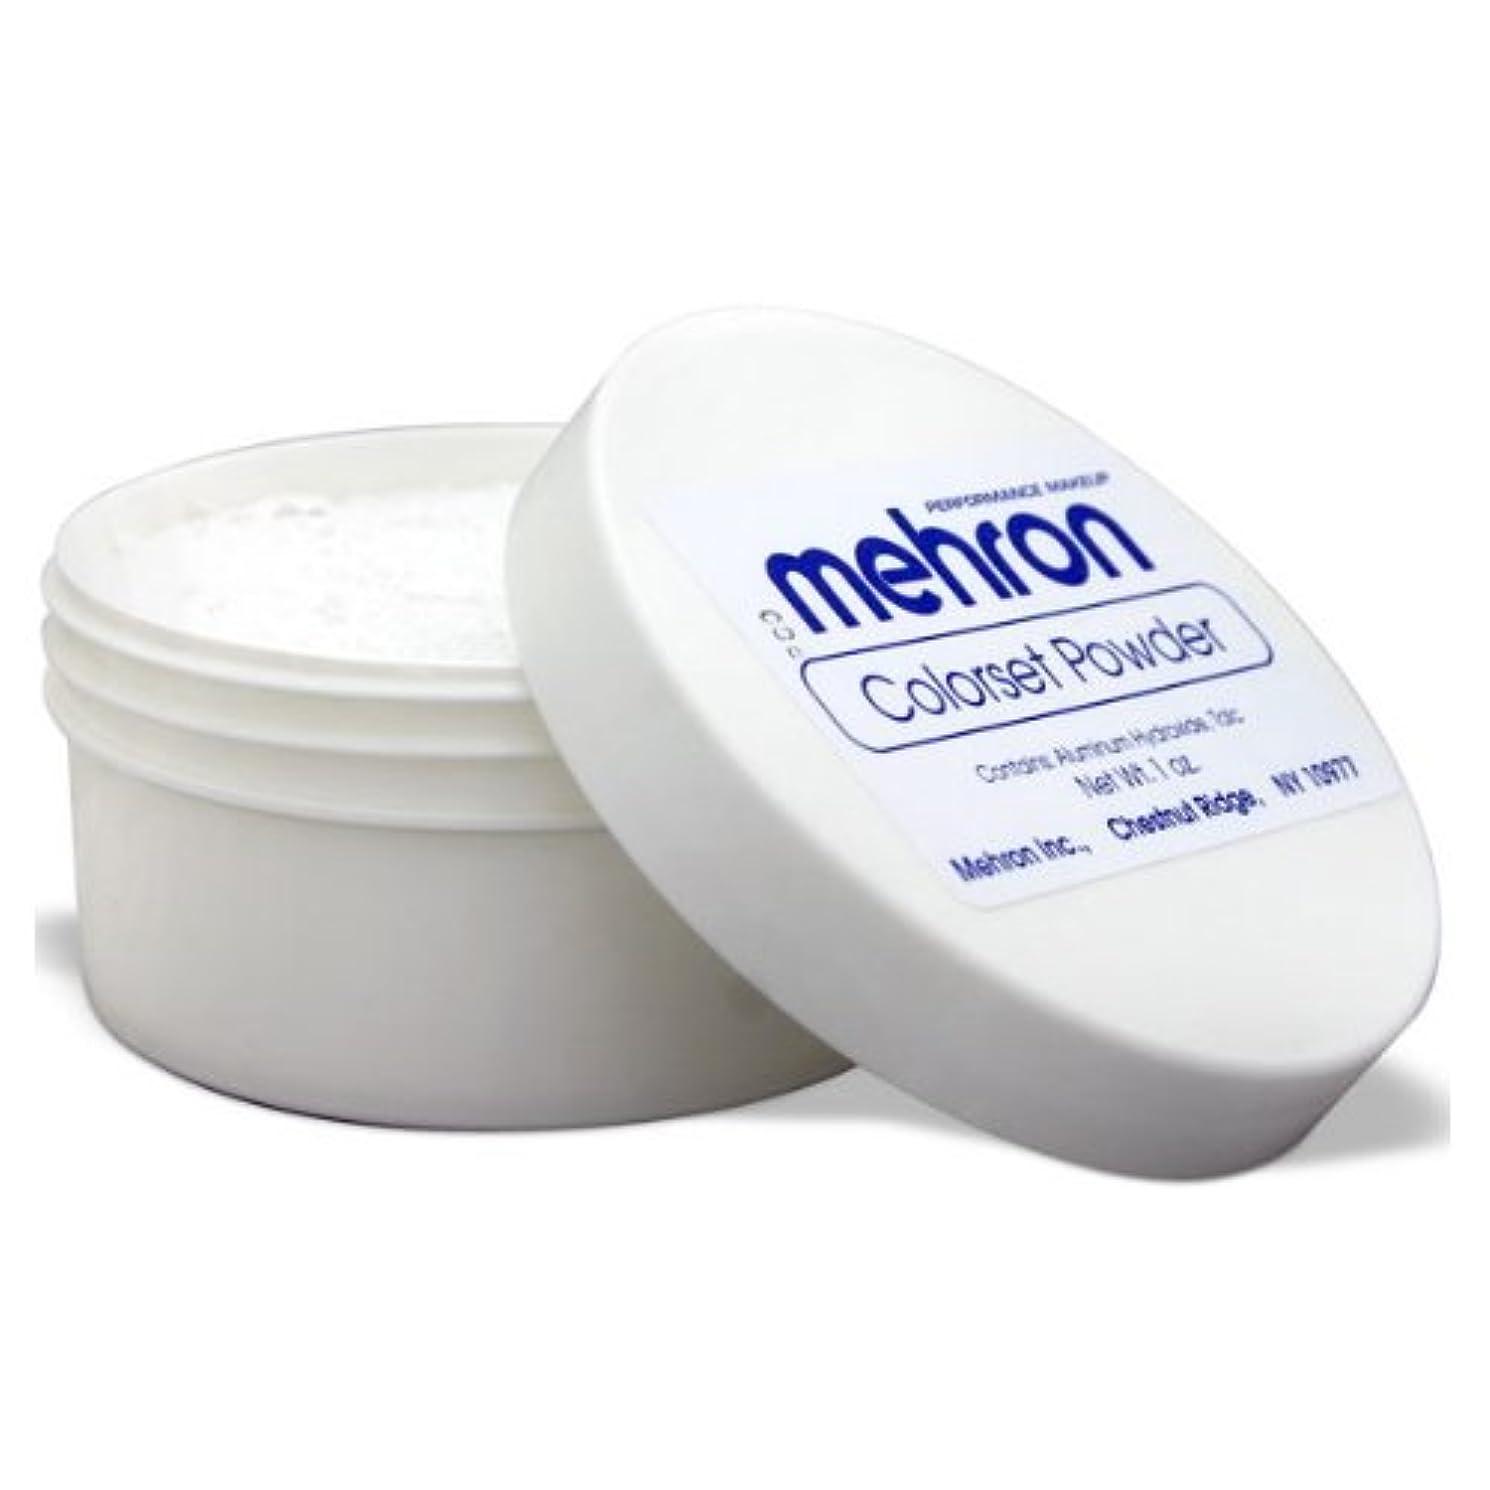 (3 Pack) mehron Colorset Powder - Translucent (並行輸入品)